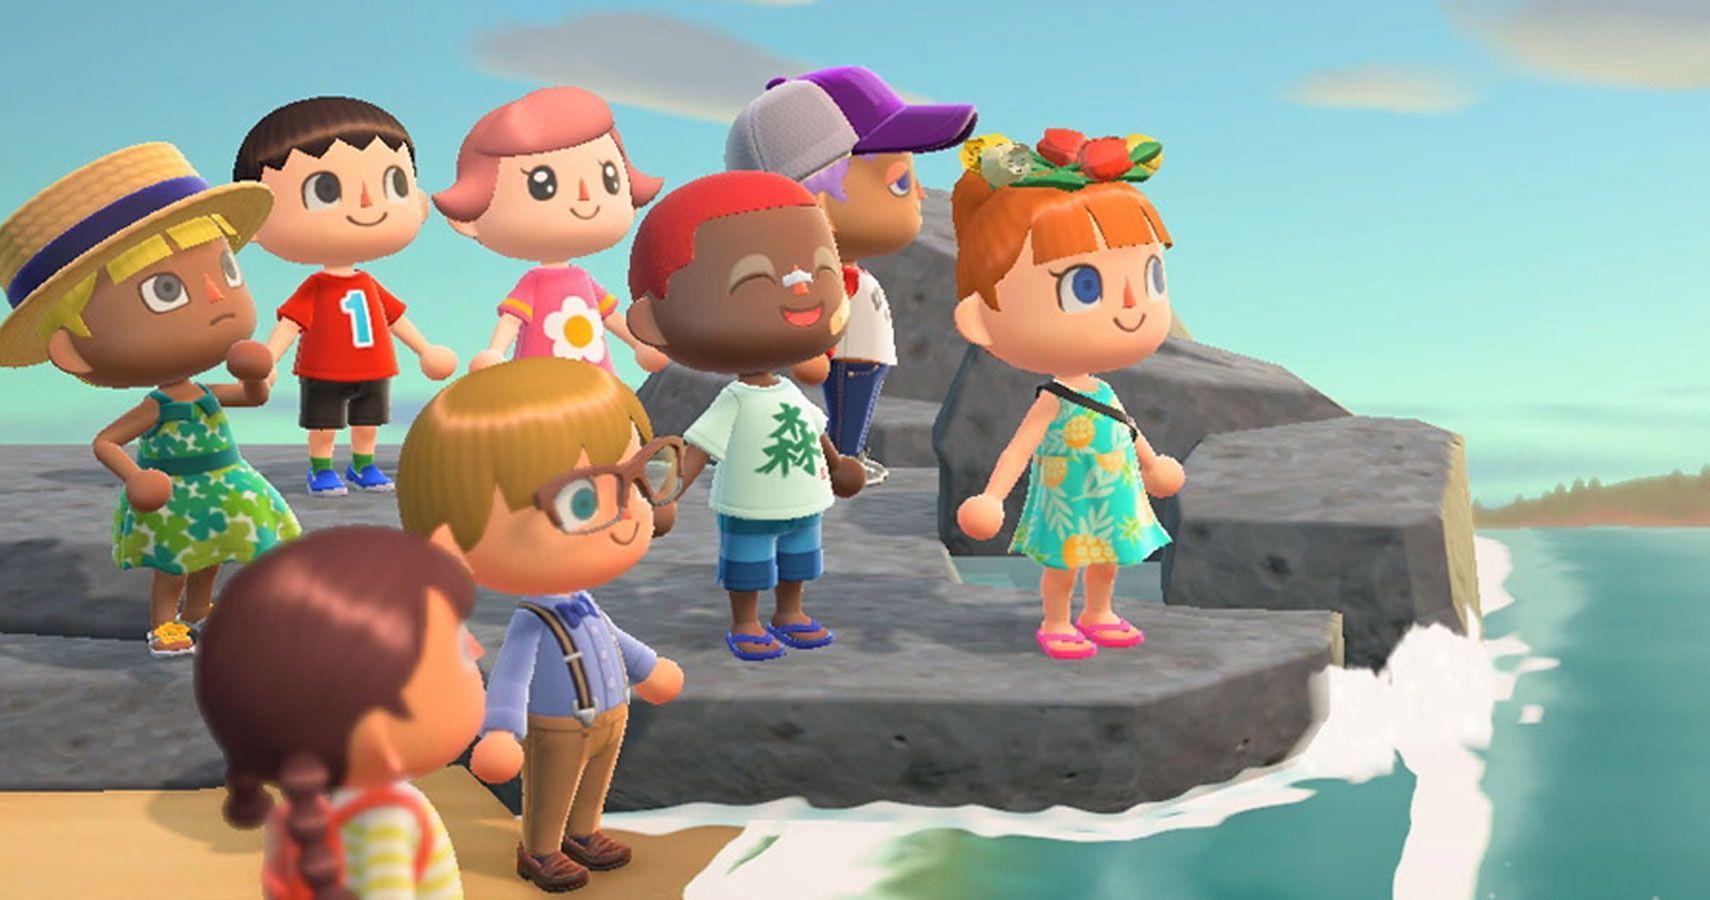 10 Best Designed Animal Crossing New Horizons Villagers